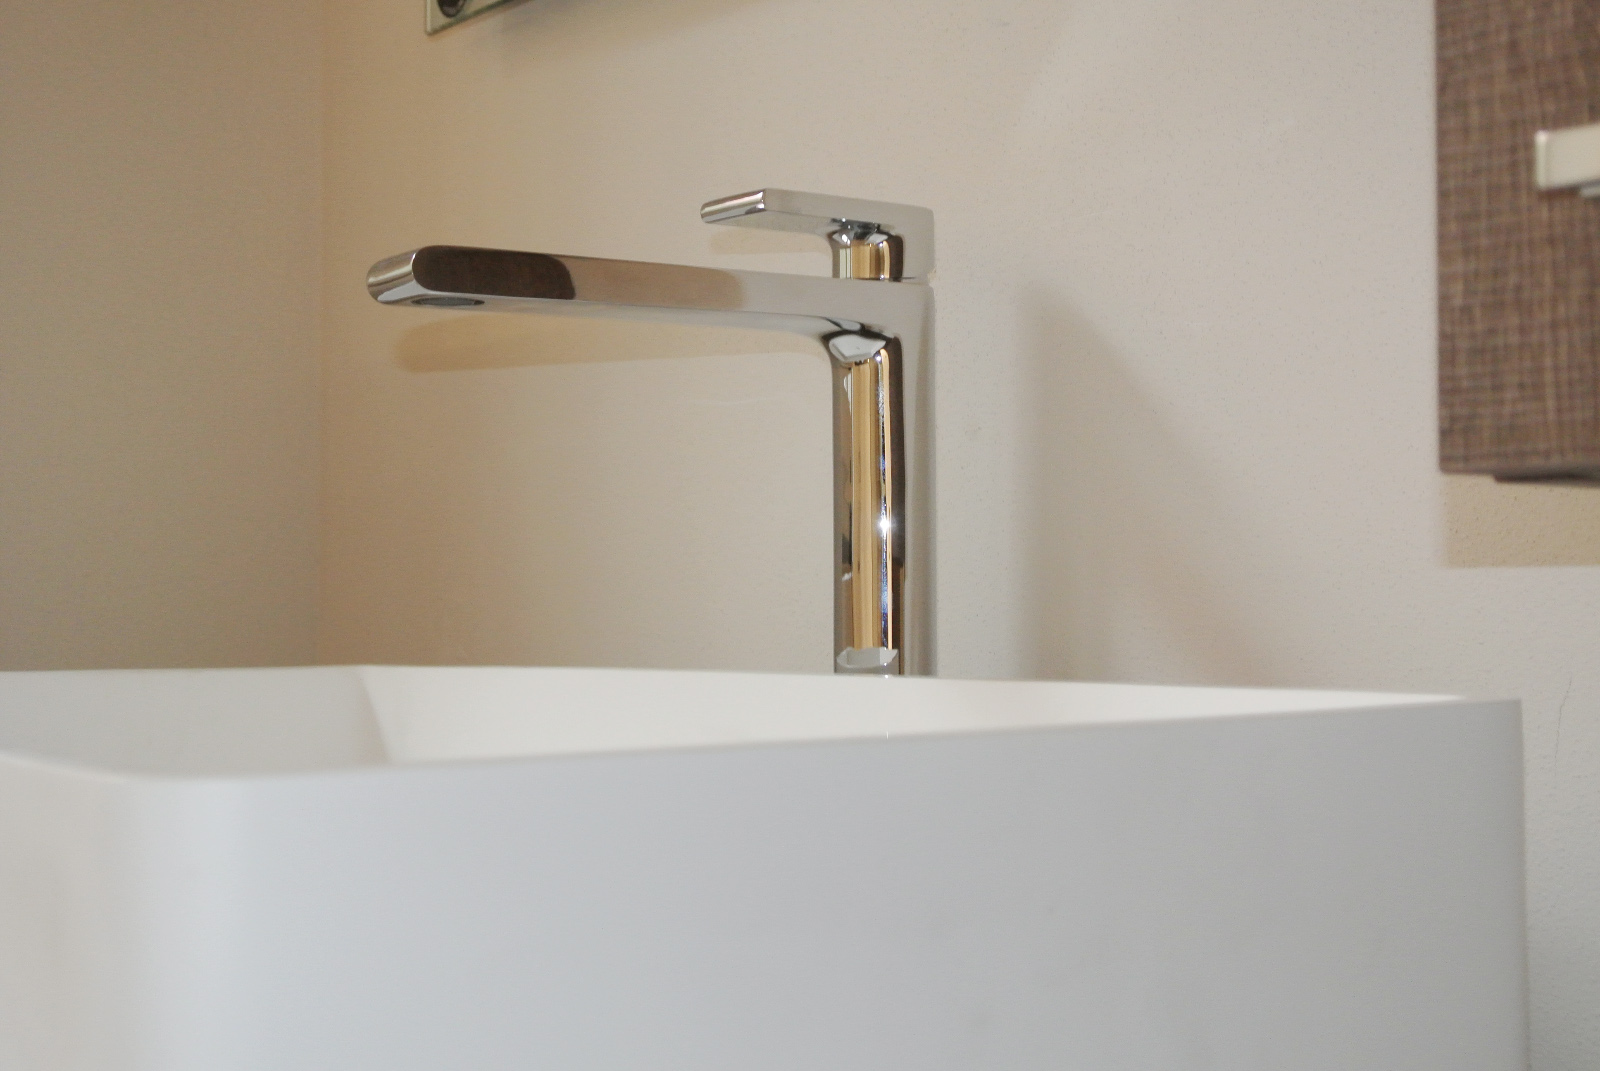 sintesibagno-verbania-arredobagno-lavabo-corian-miscelatore-lavabo-prolungato-bpnomi-bonny_0